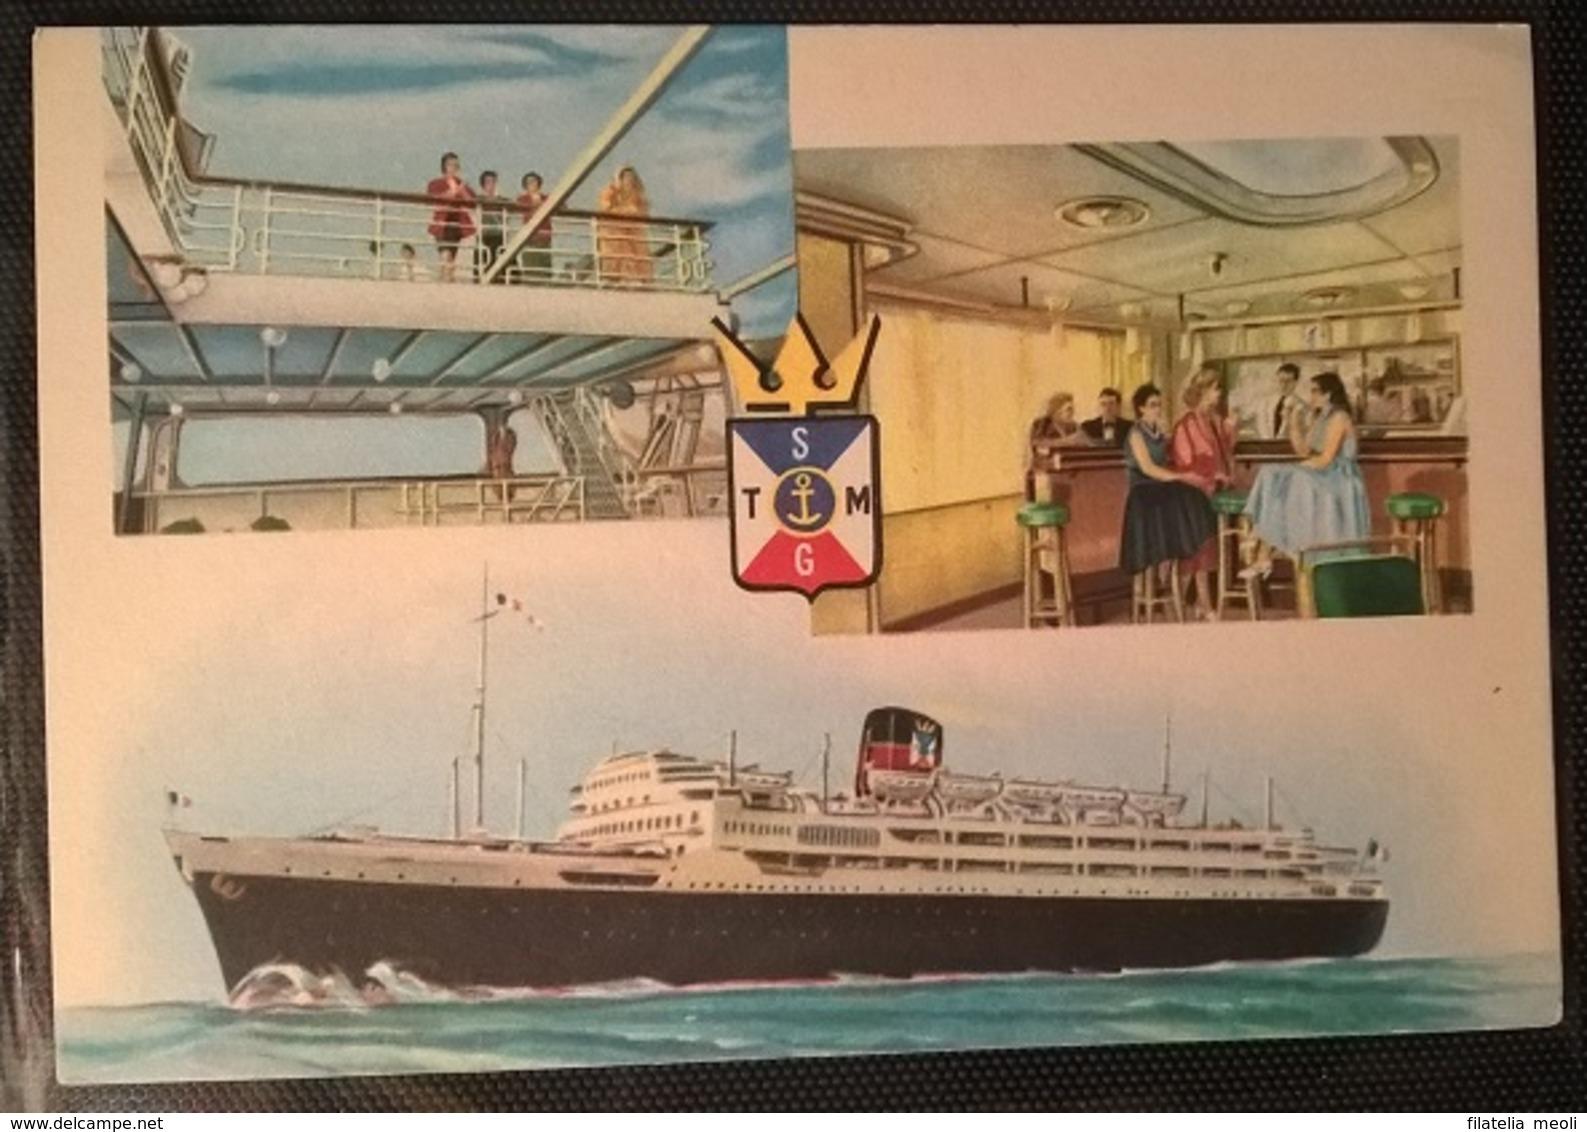 TRANSATLANTICI - SGTM PROVENCE - Barche